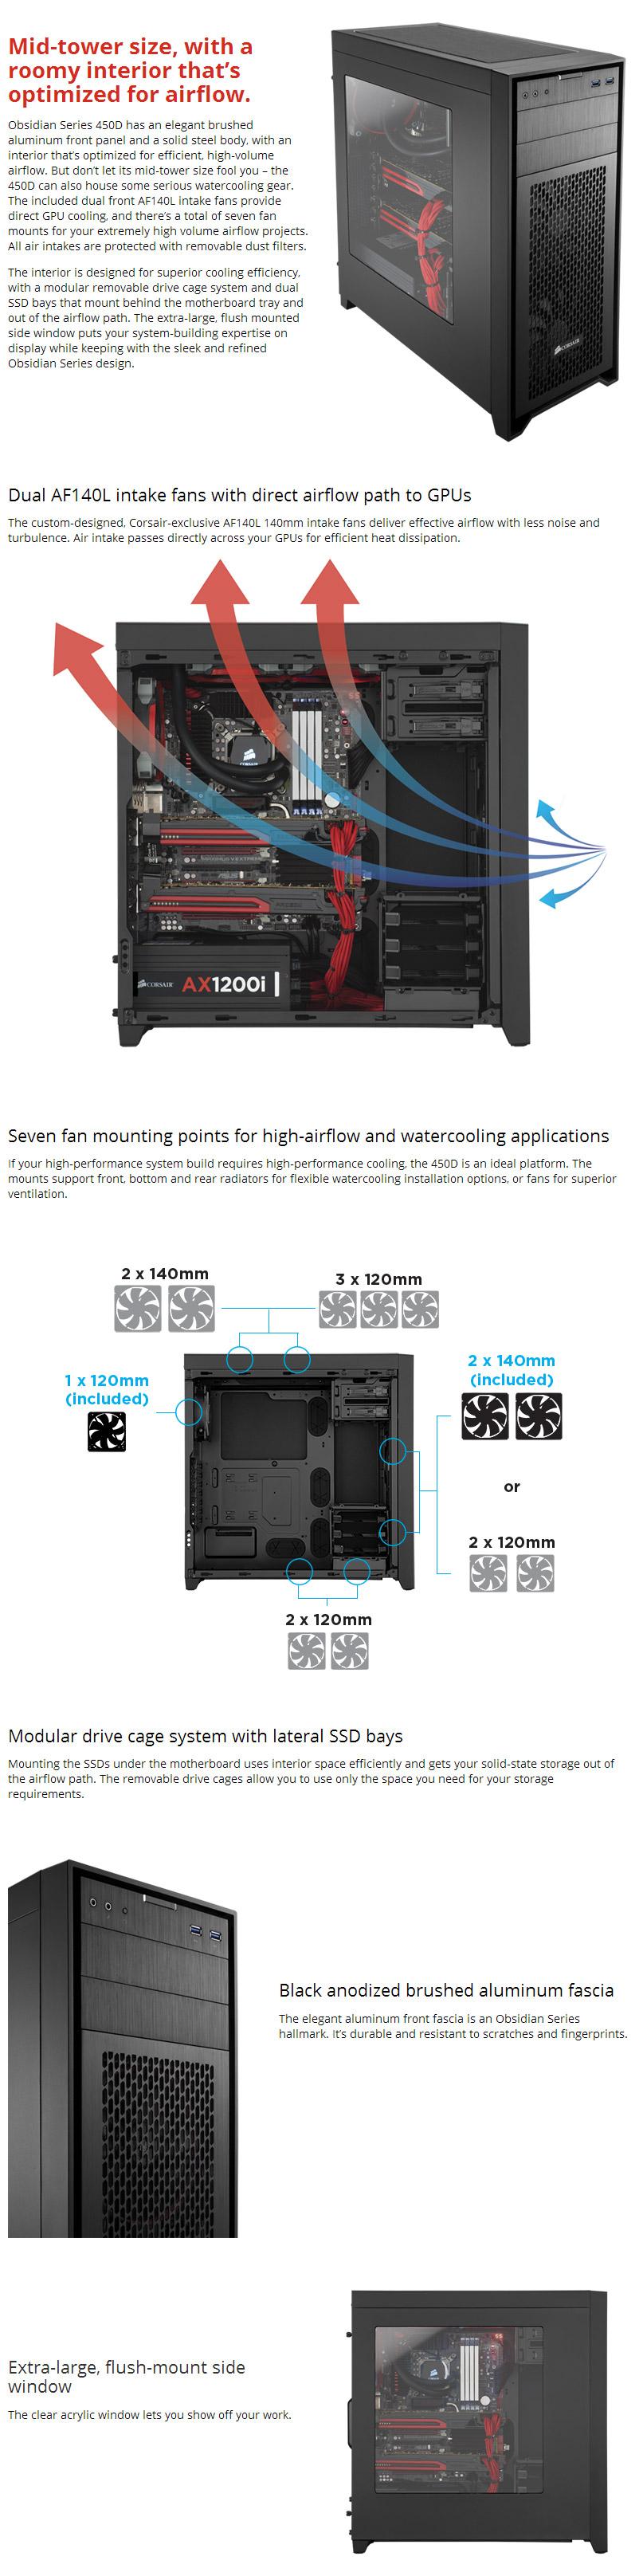 cc450d-features.jpg